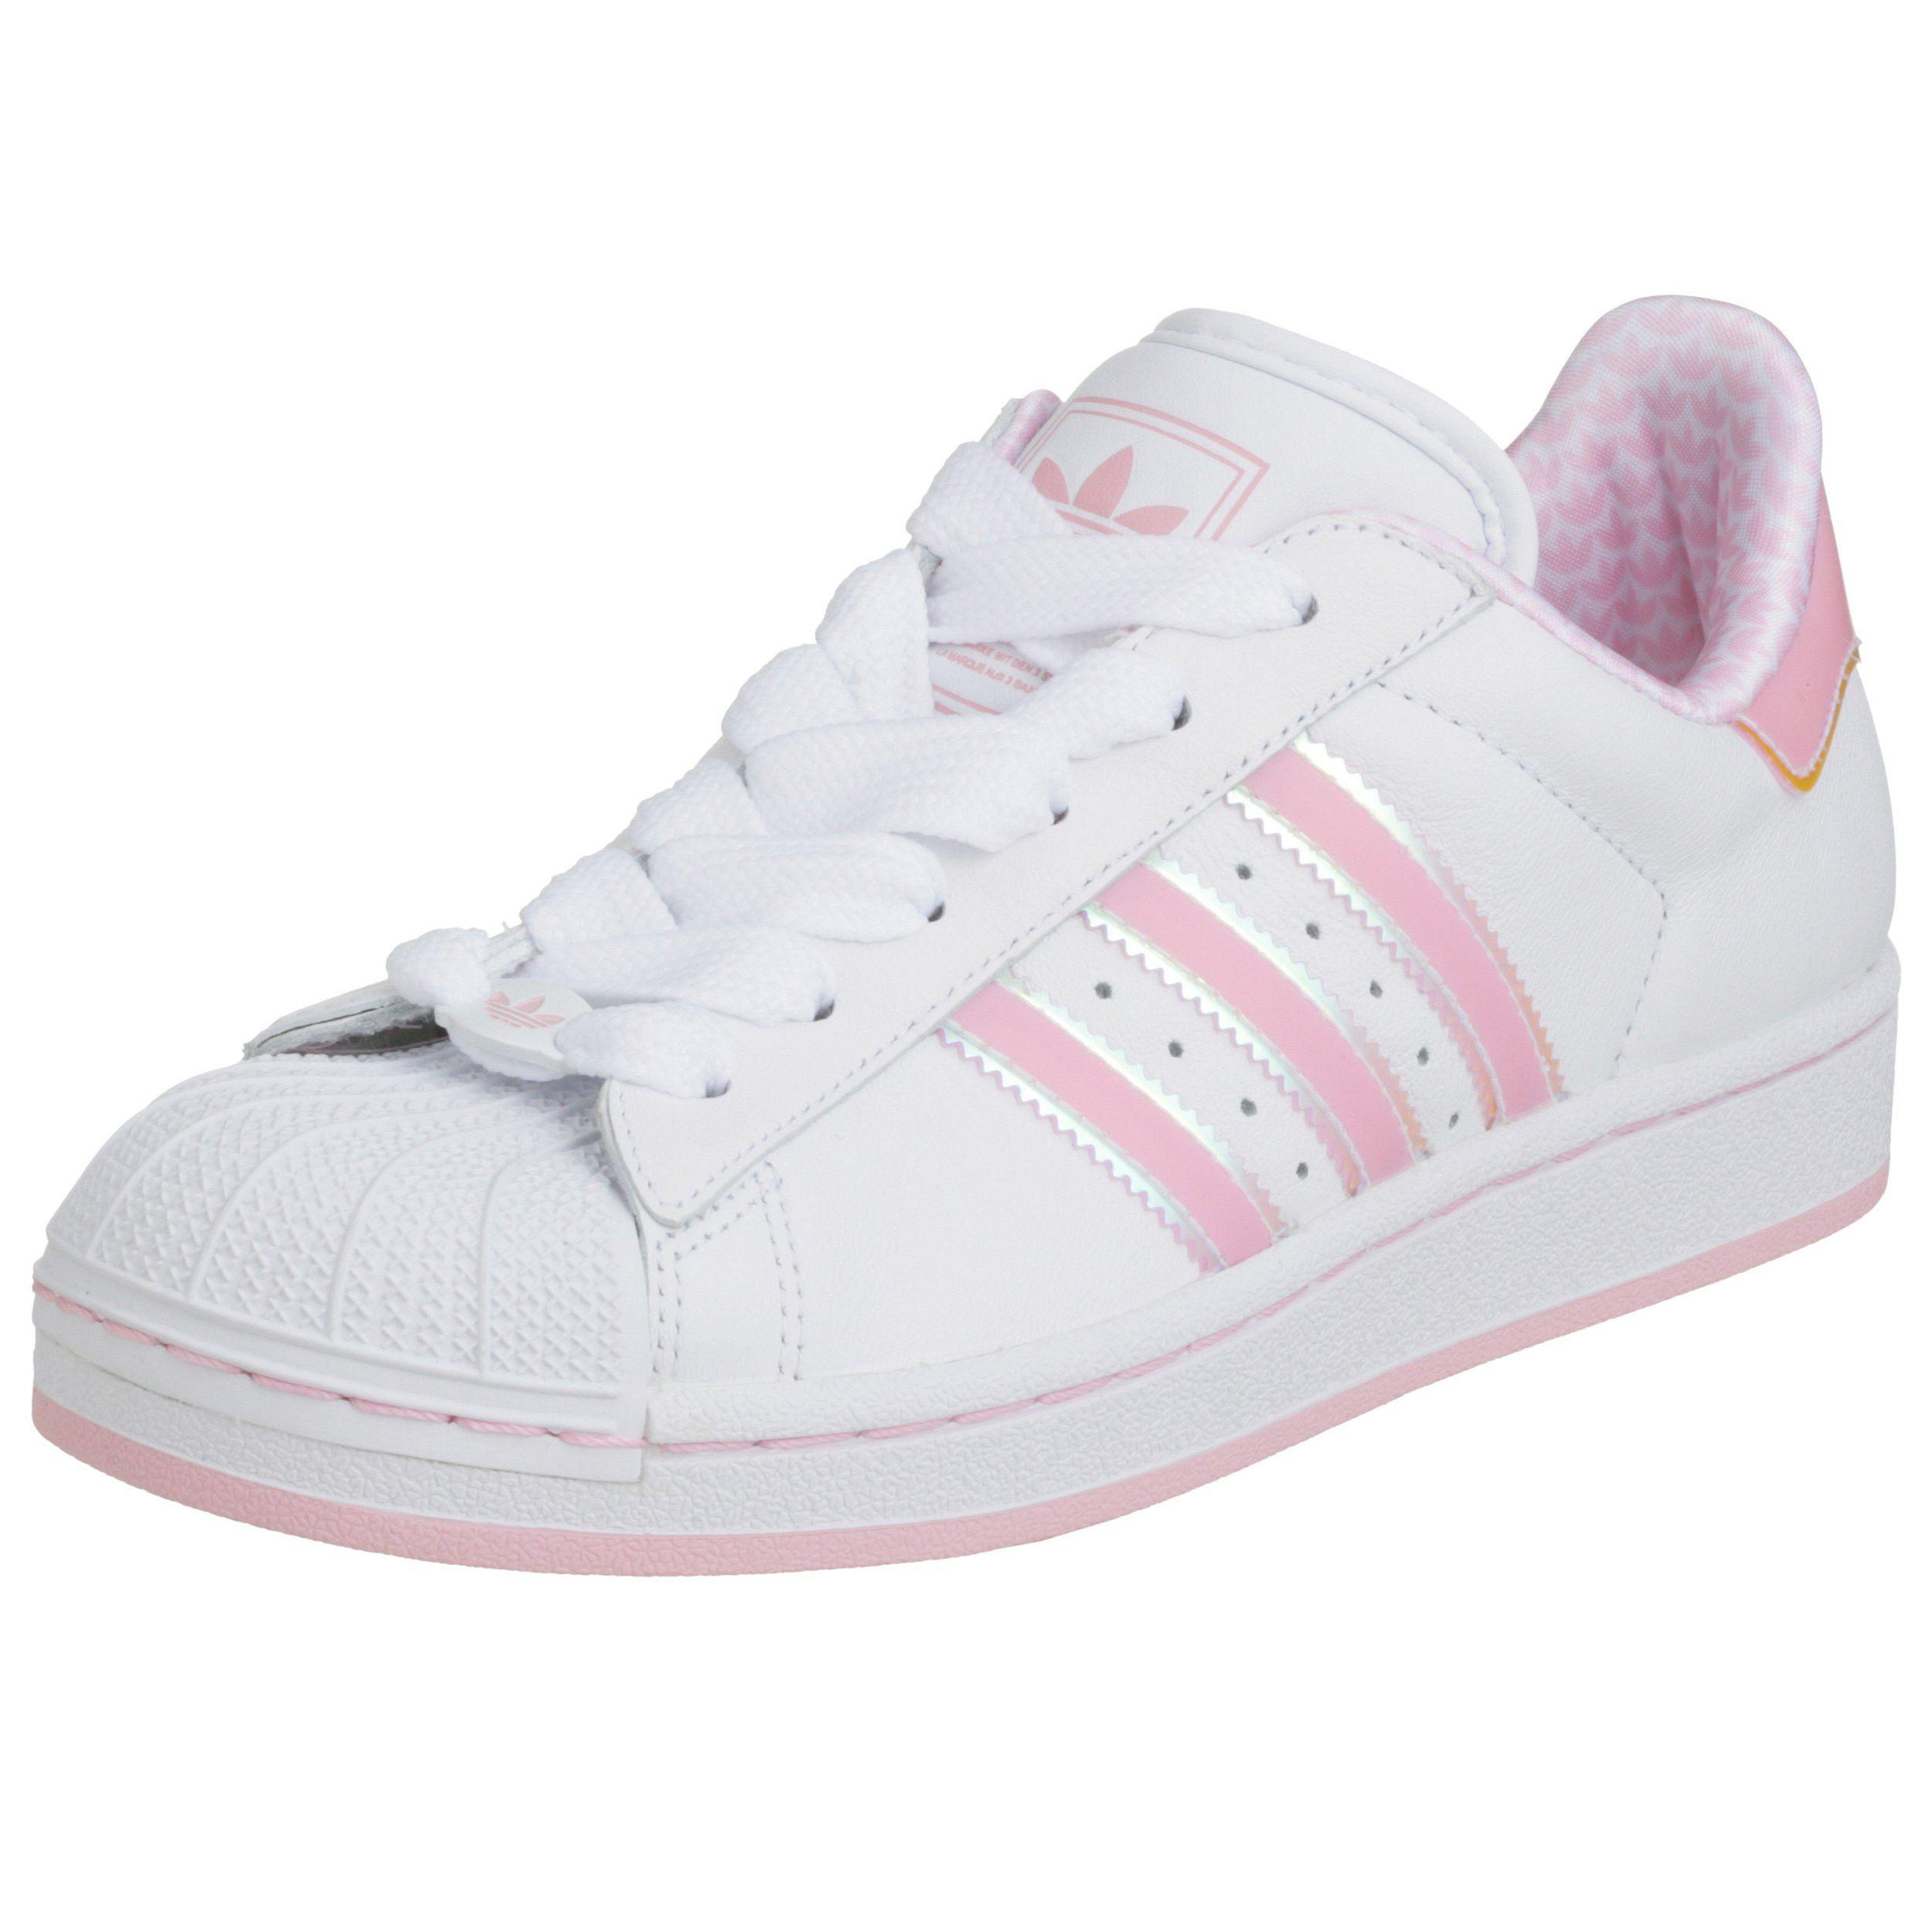 Pin Da Adidas Bambino Quekie Scarpe Pinterest Adidas Da Superstar E Adidas 0bf82b